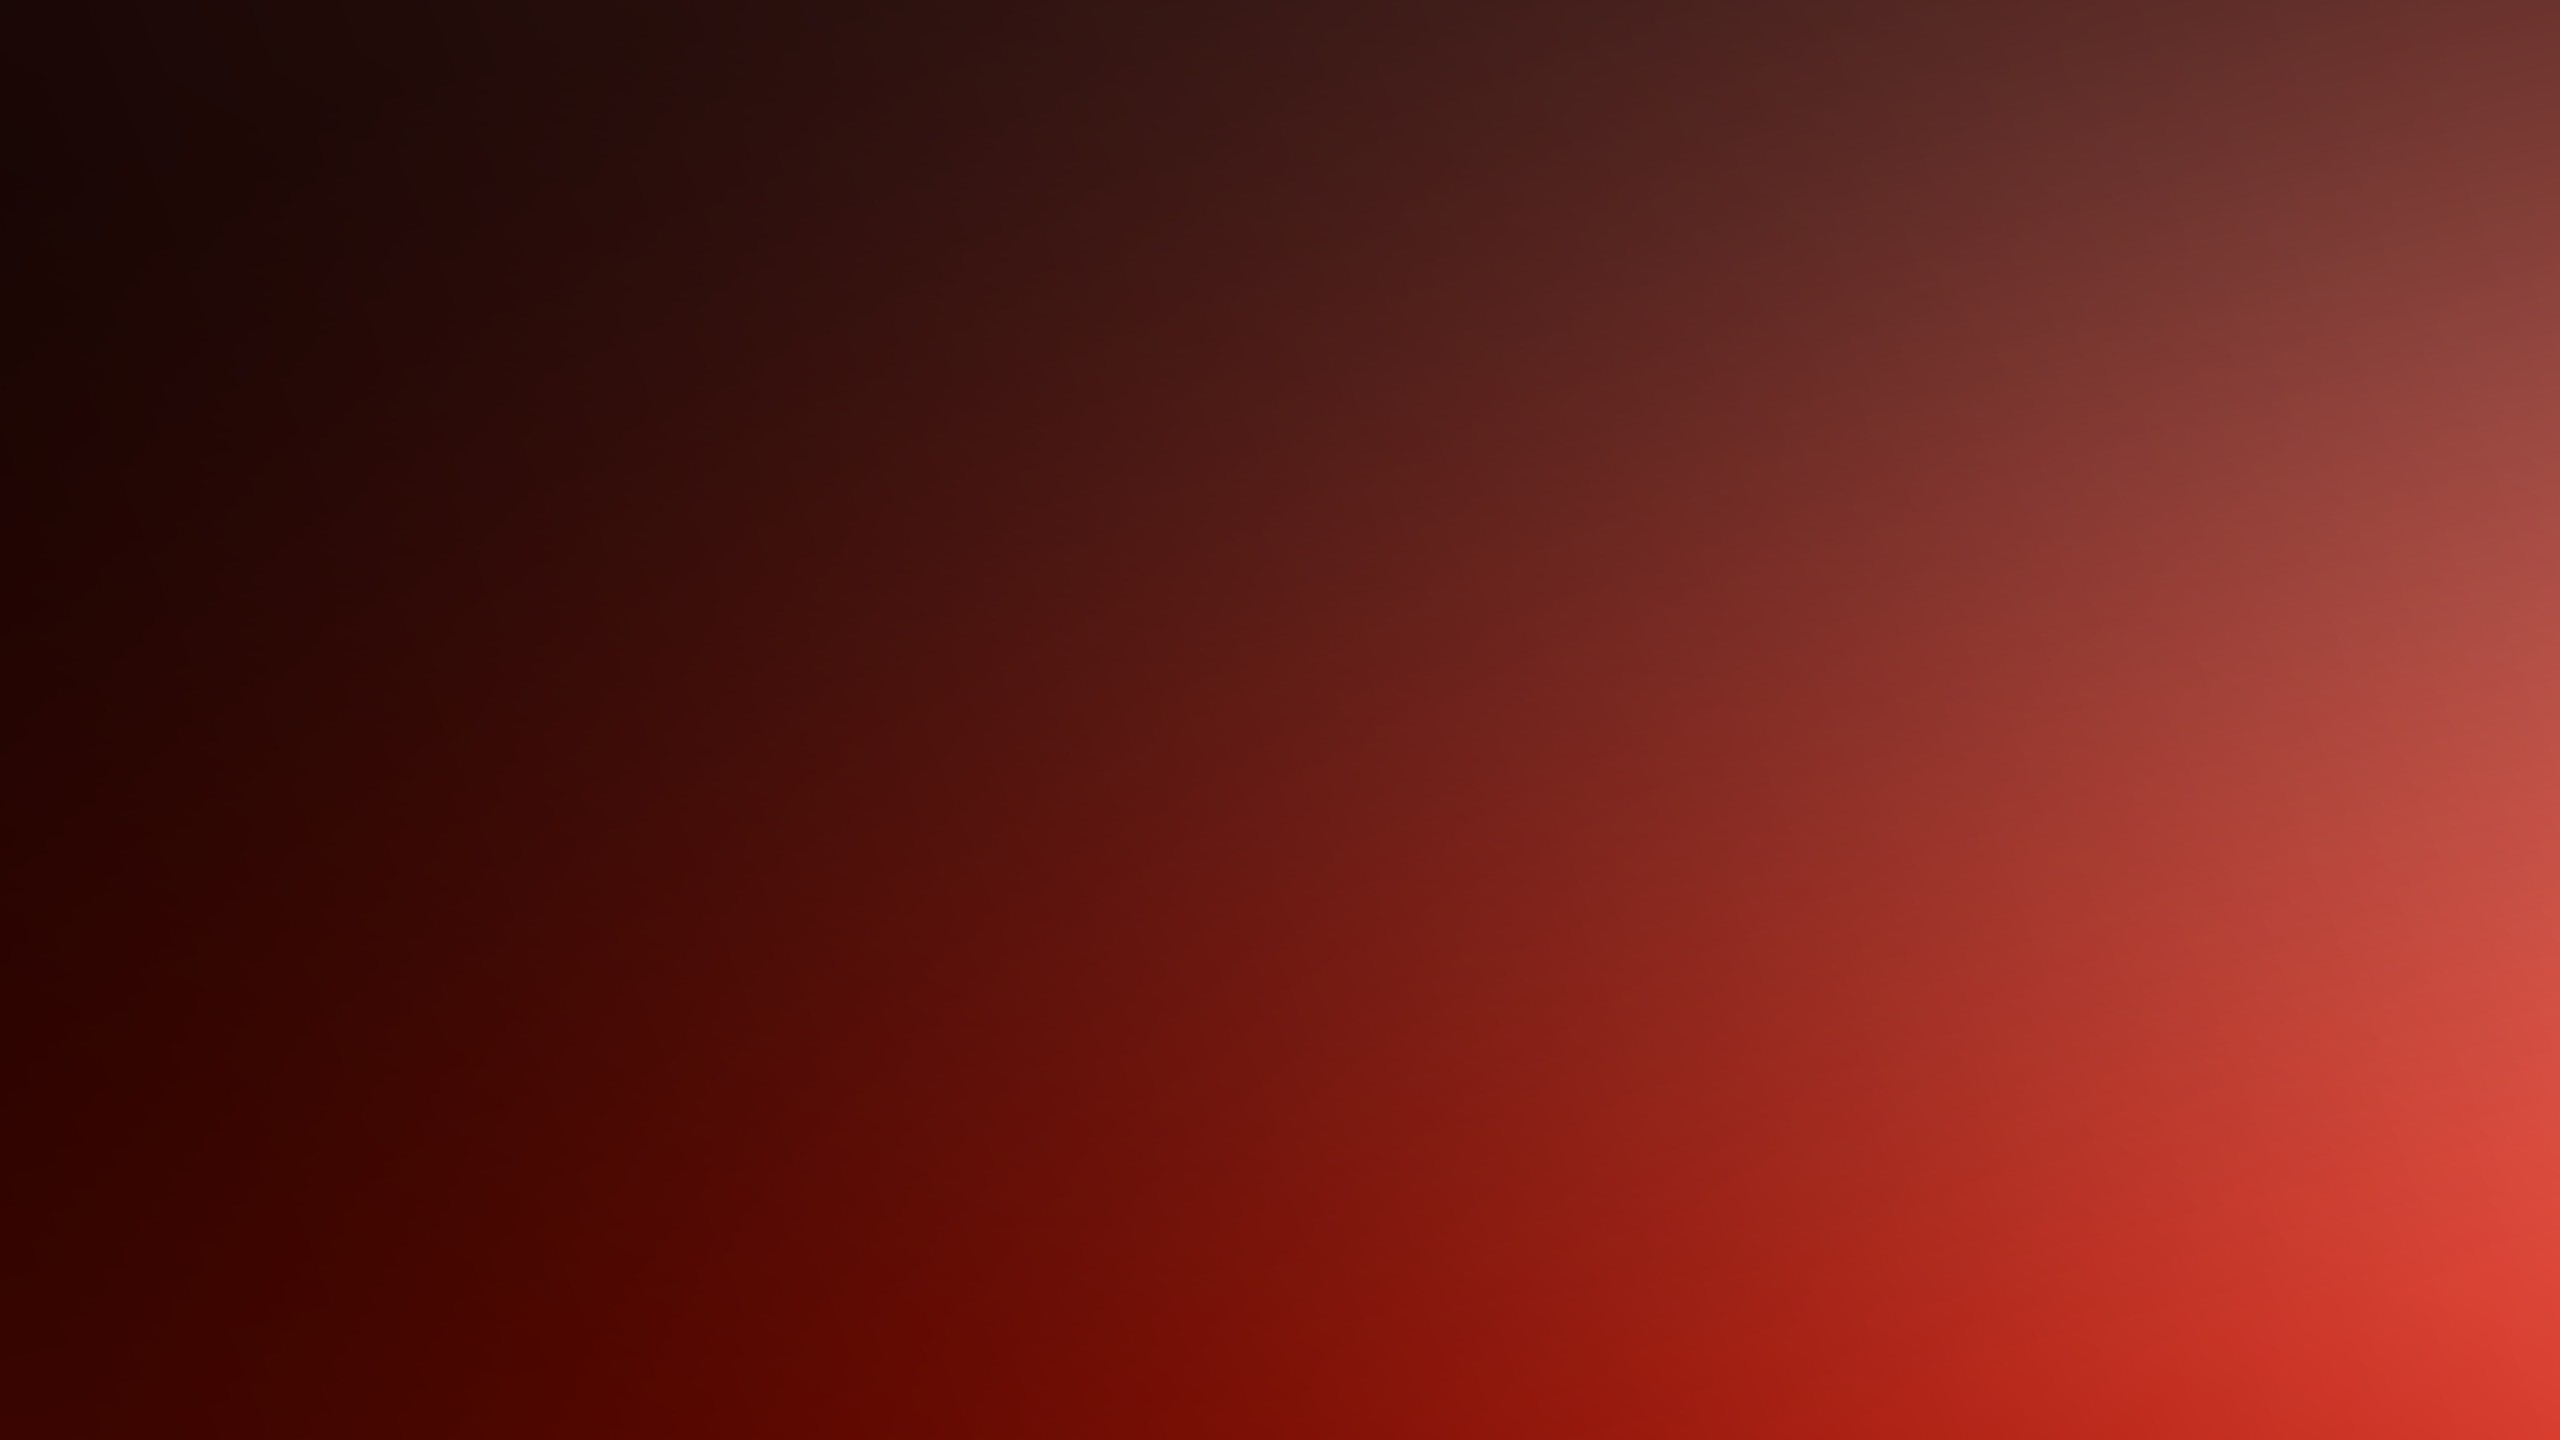 Description: Download Minimalistic dark red multicolor textures windows 8 backgrounds  wallpaper/desktop background in HD & Widescreen resolution.